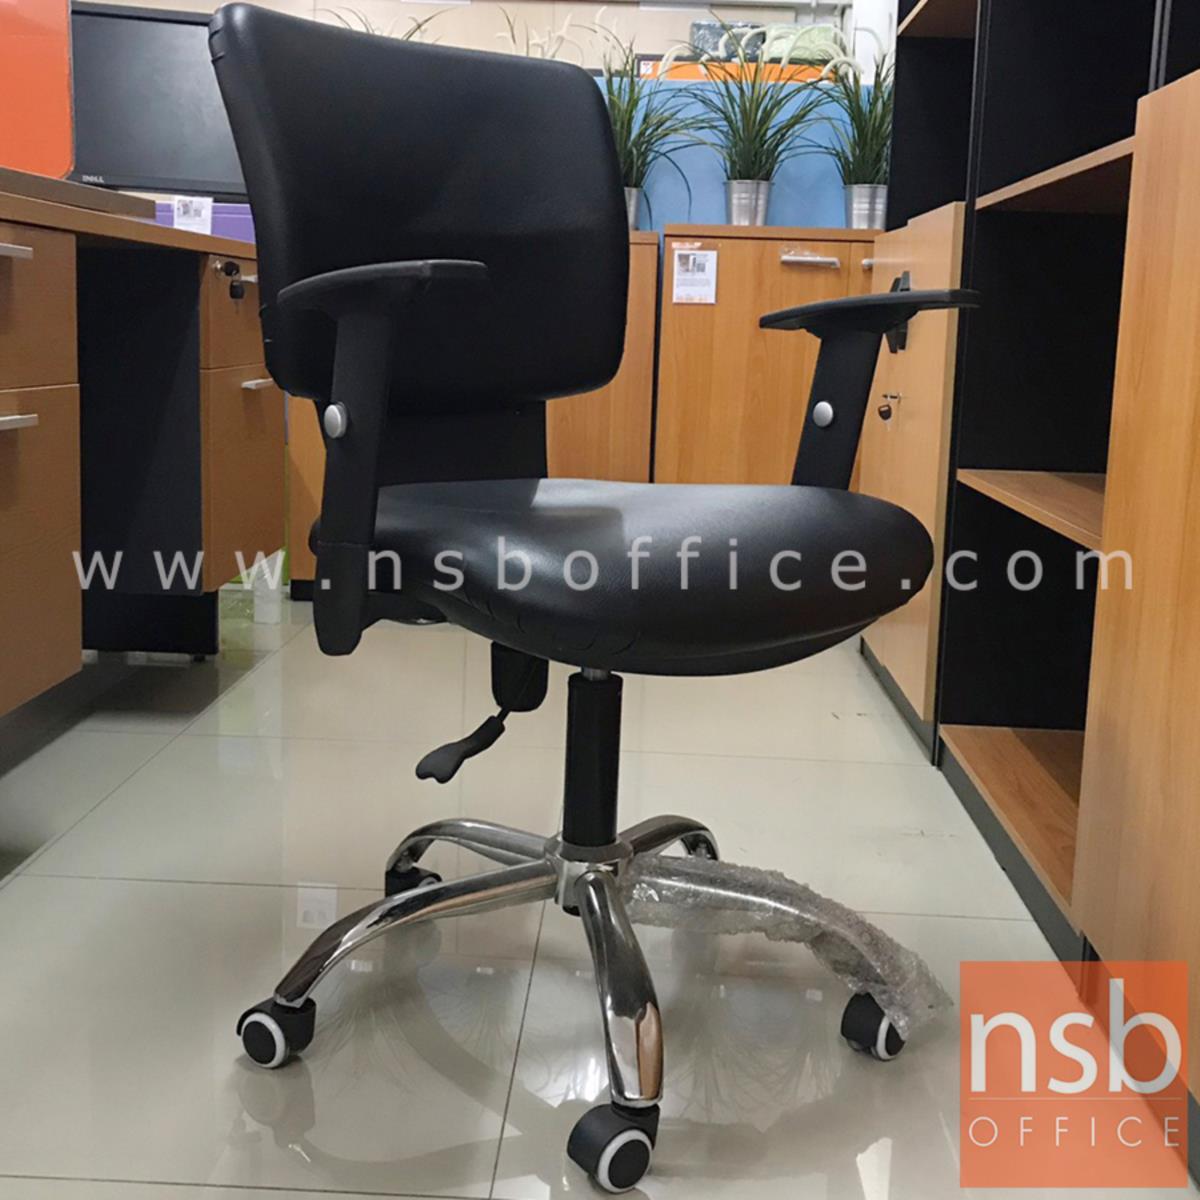 L02A279:เก้าอี้สำนักงาน รุ่น NSB-CHAIR1  โช๊คแก๊ส มีก้อนโยก ขาเหล็ก (STOCK-1 ตัว)